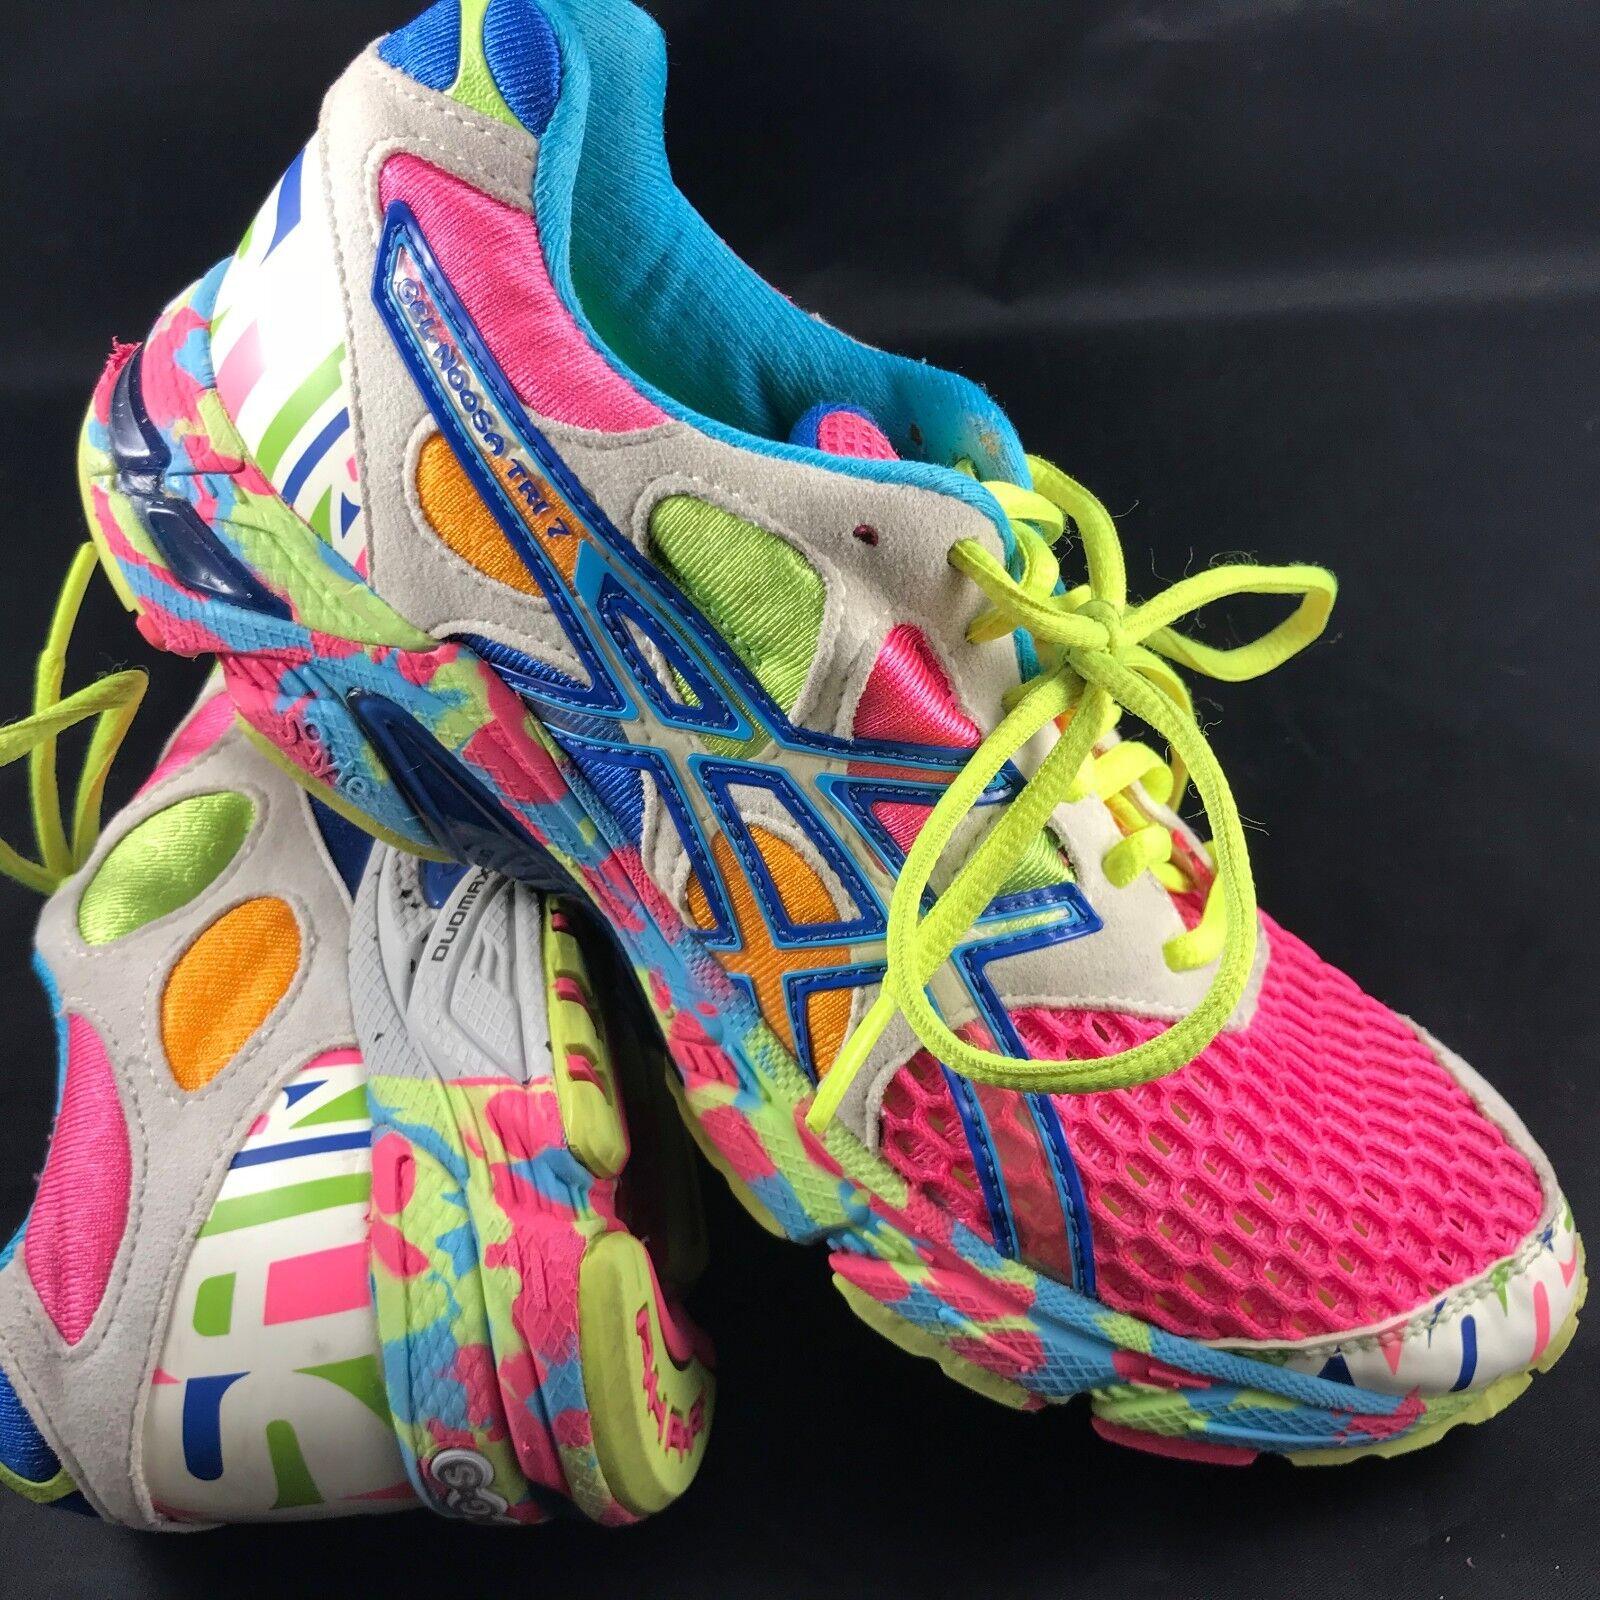 ASICS Damenschuhe GEL-NOOSA Tri-7 Triathlon training Damenschuhe EUR 6.5 37.5 EUR Damenschuhe Multicolor f7401c